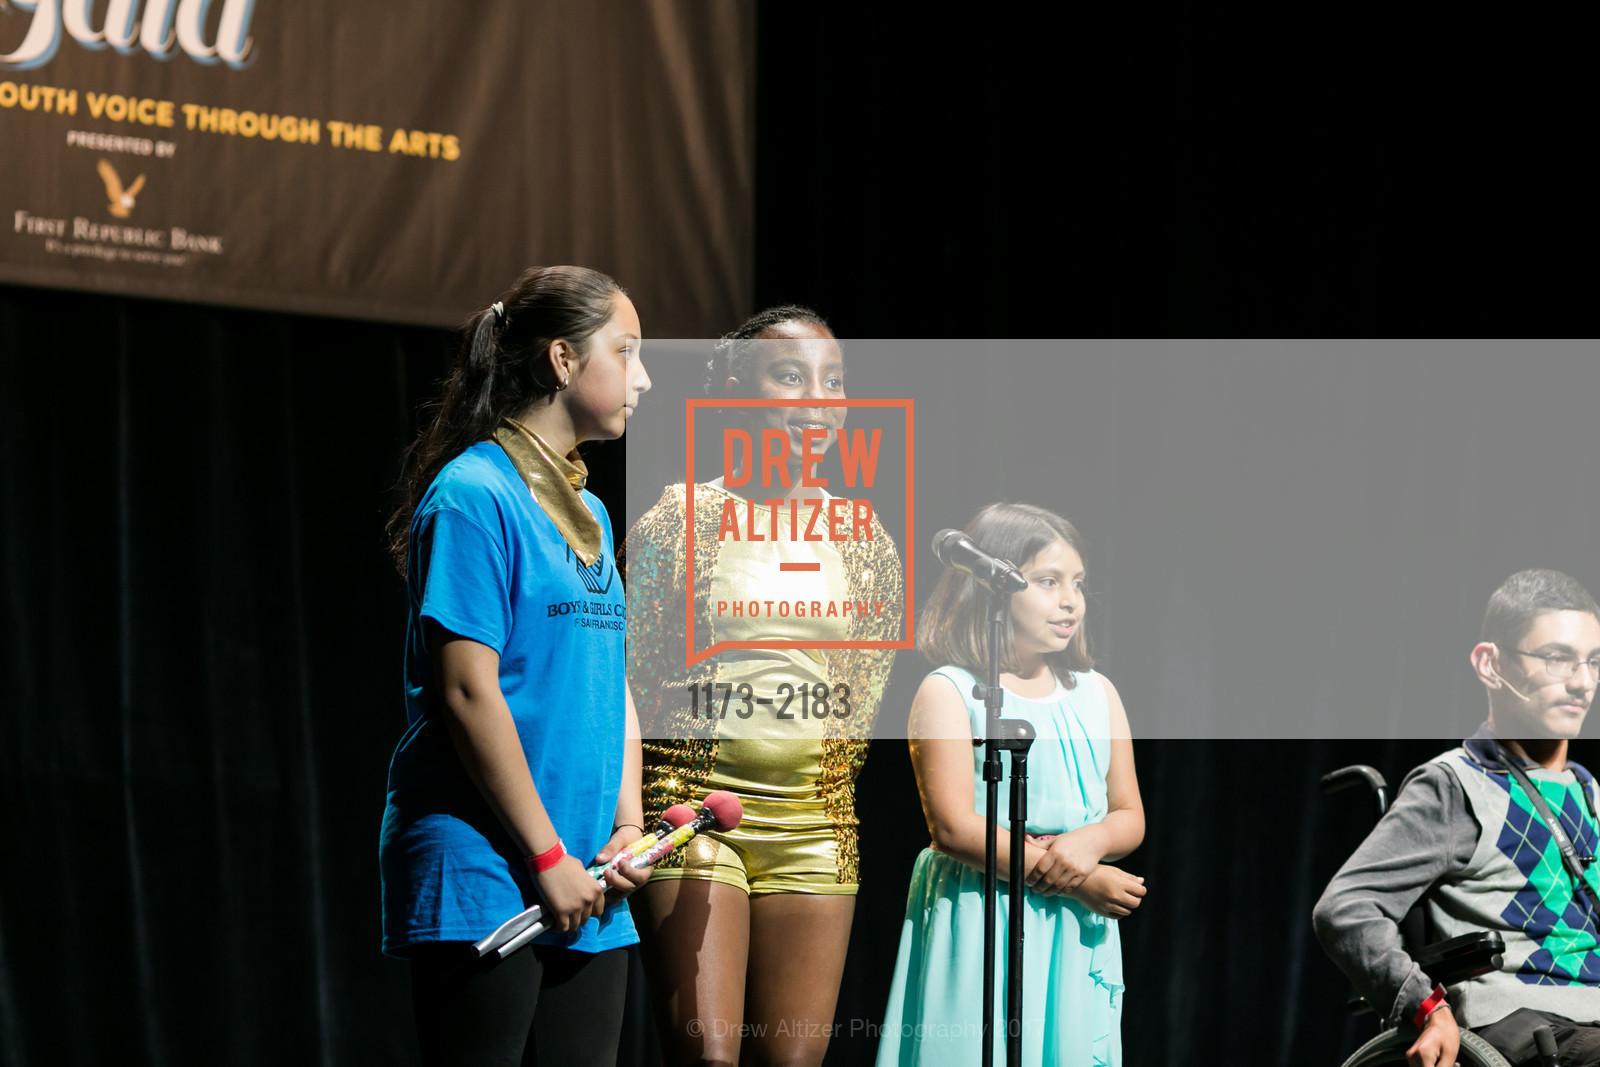 Performance, Photo #1173-2183